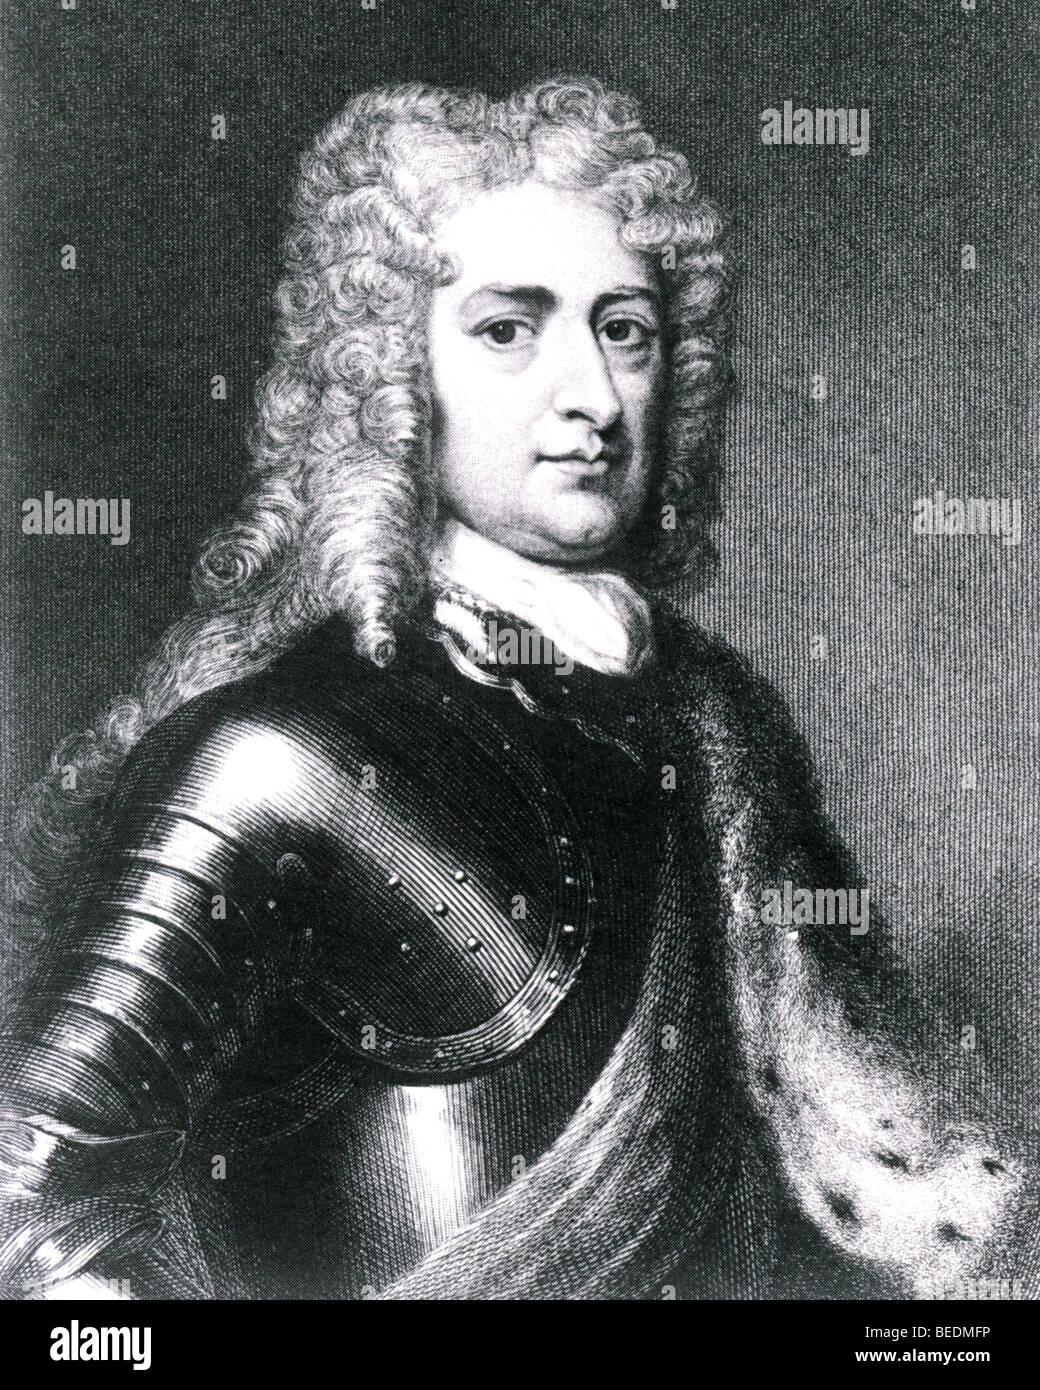 JOHN CHURCHILL, Ist Duke of Marlborough (1650-1722) - Stock Image